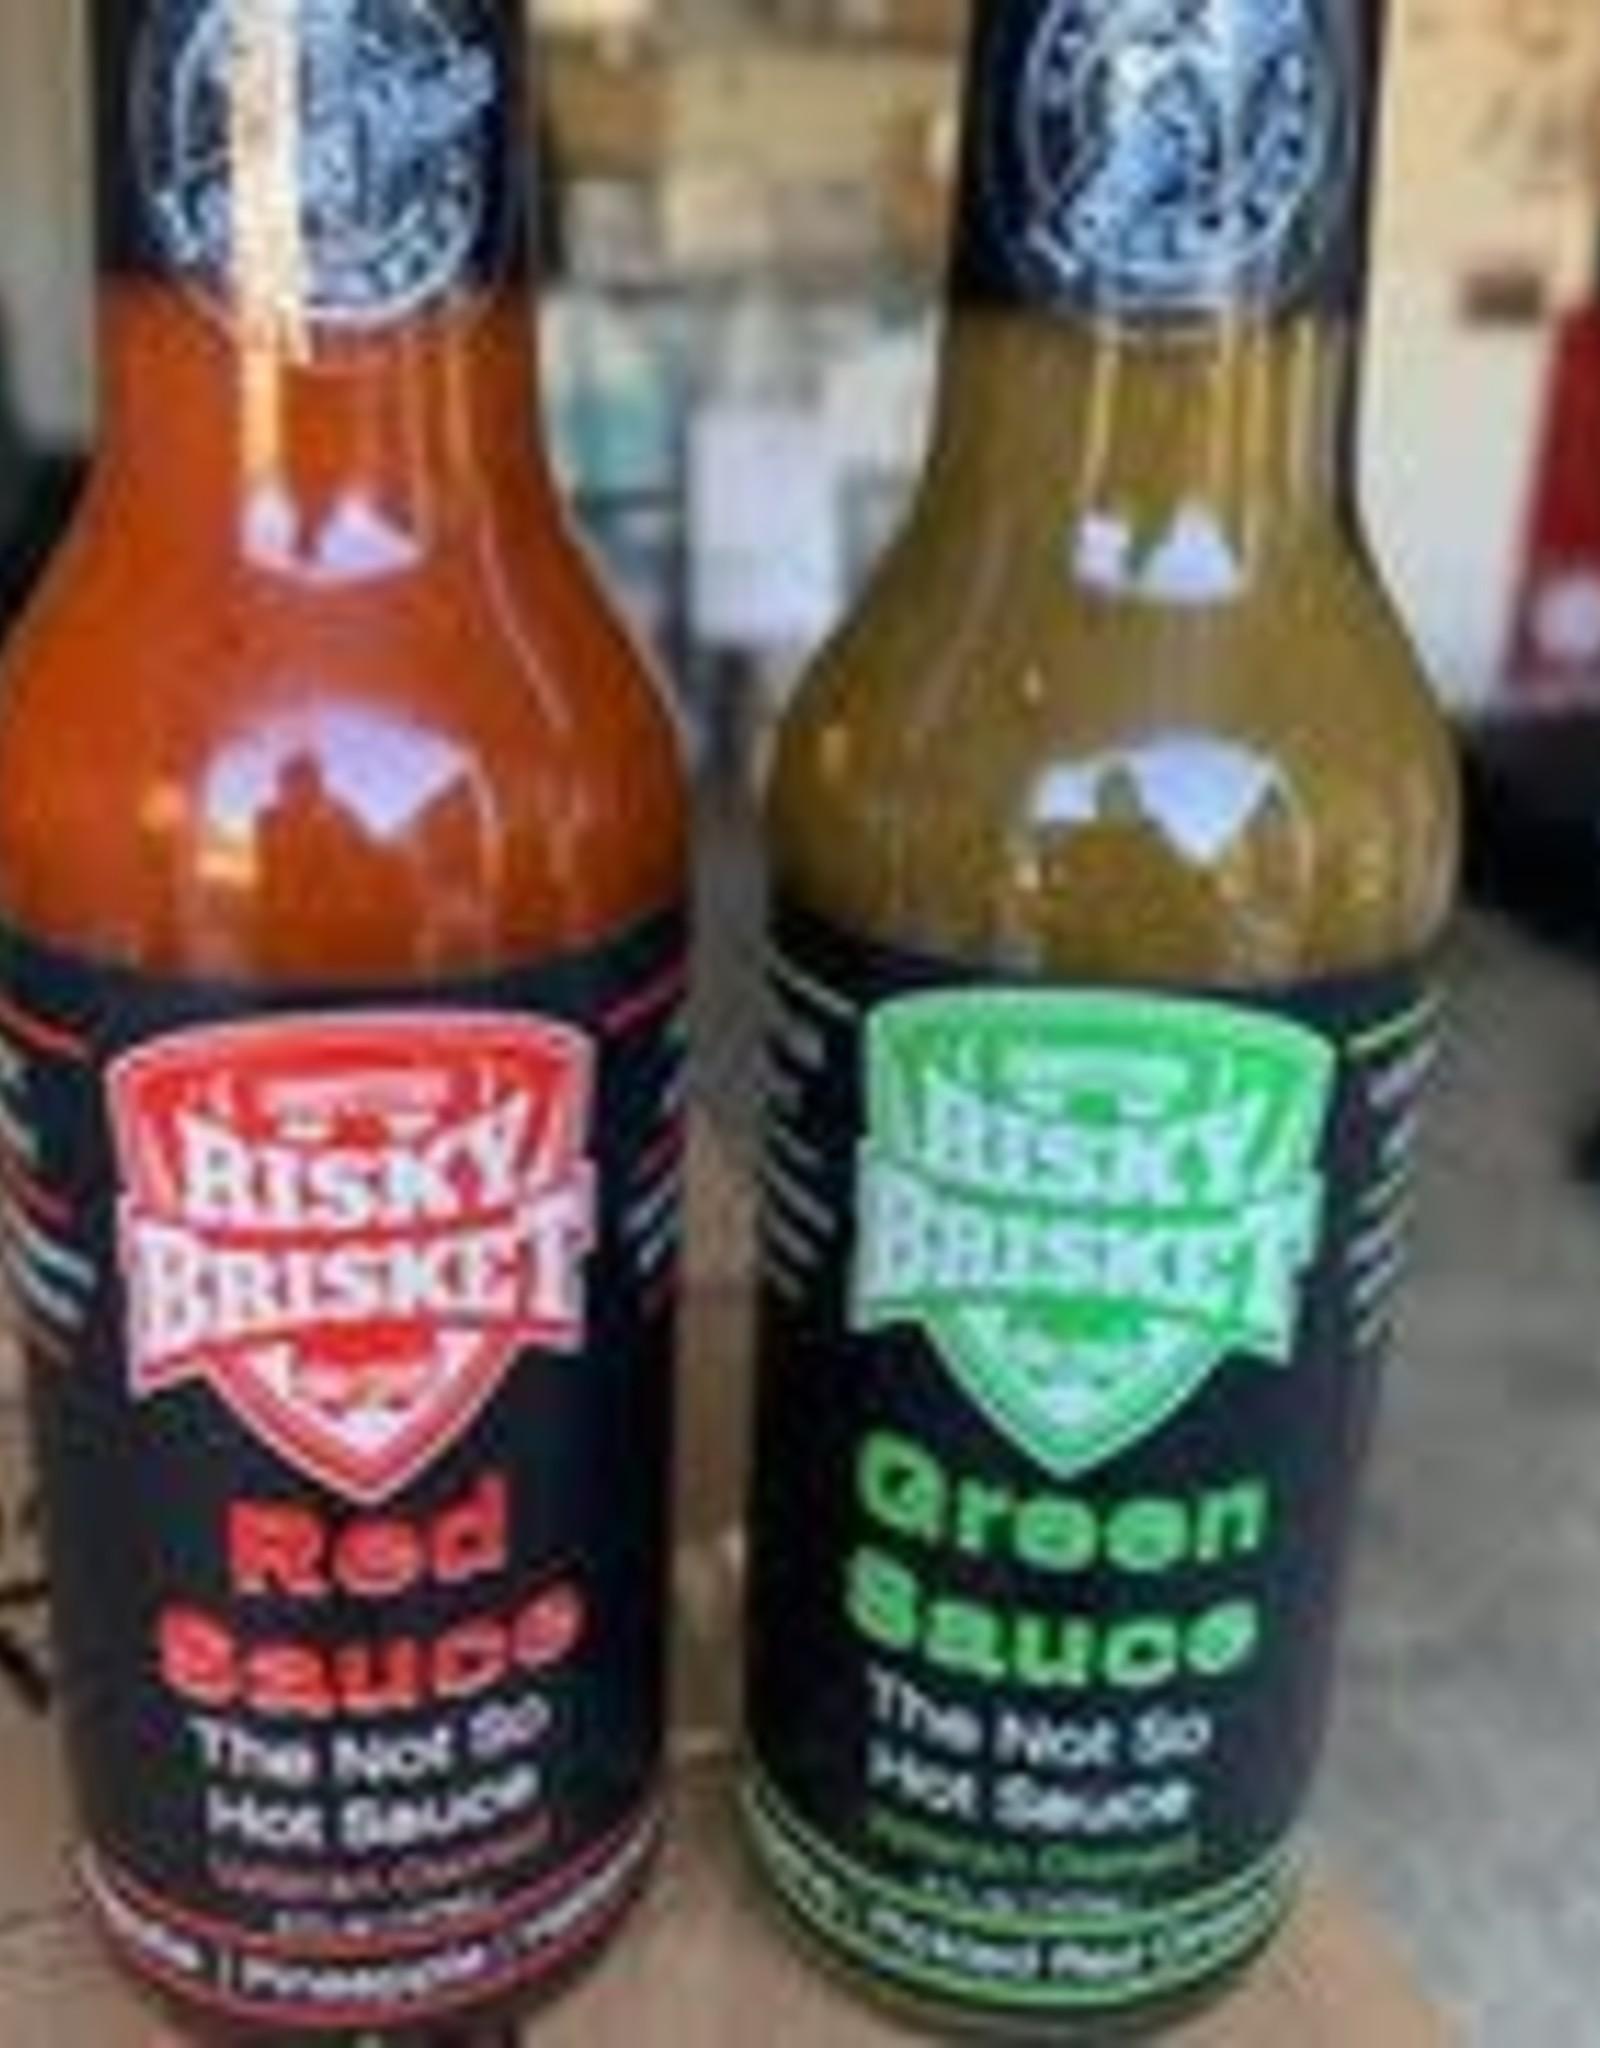 Risky Brisket Green Sauce